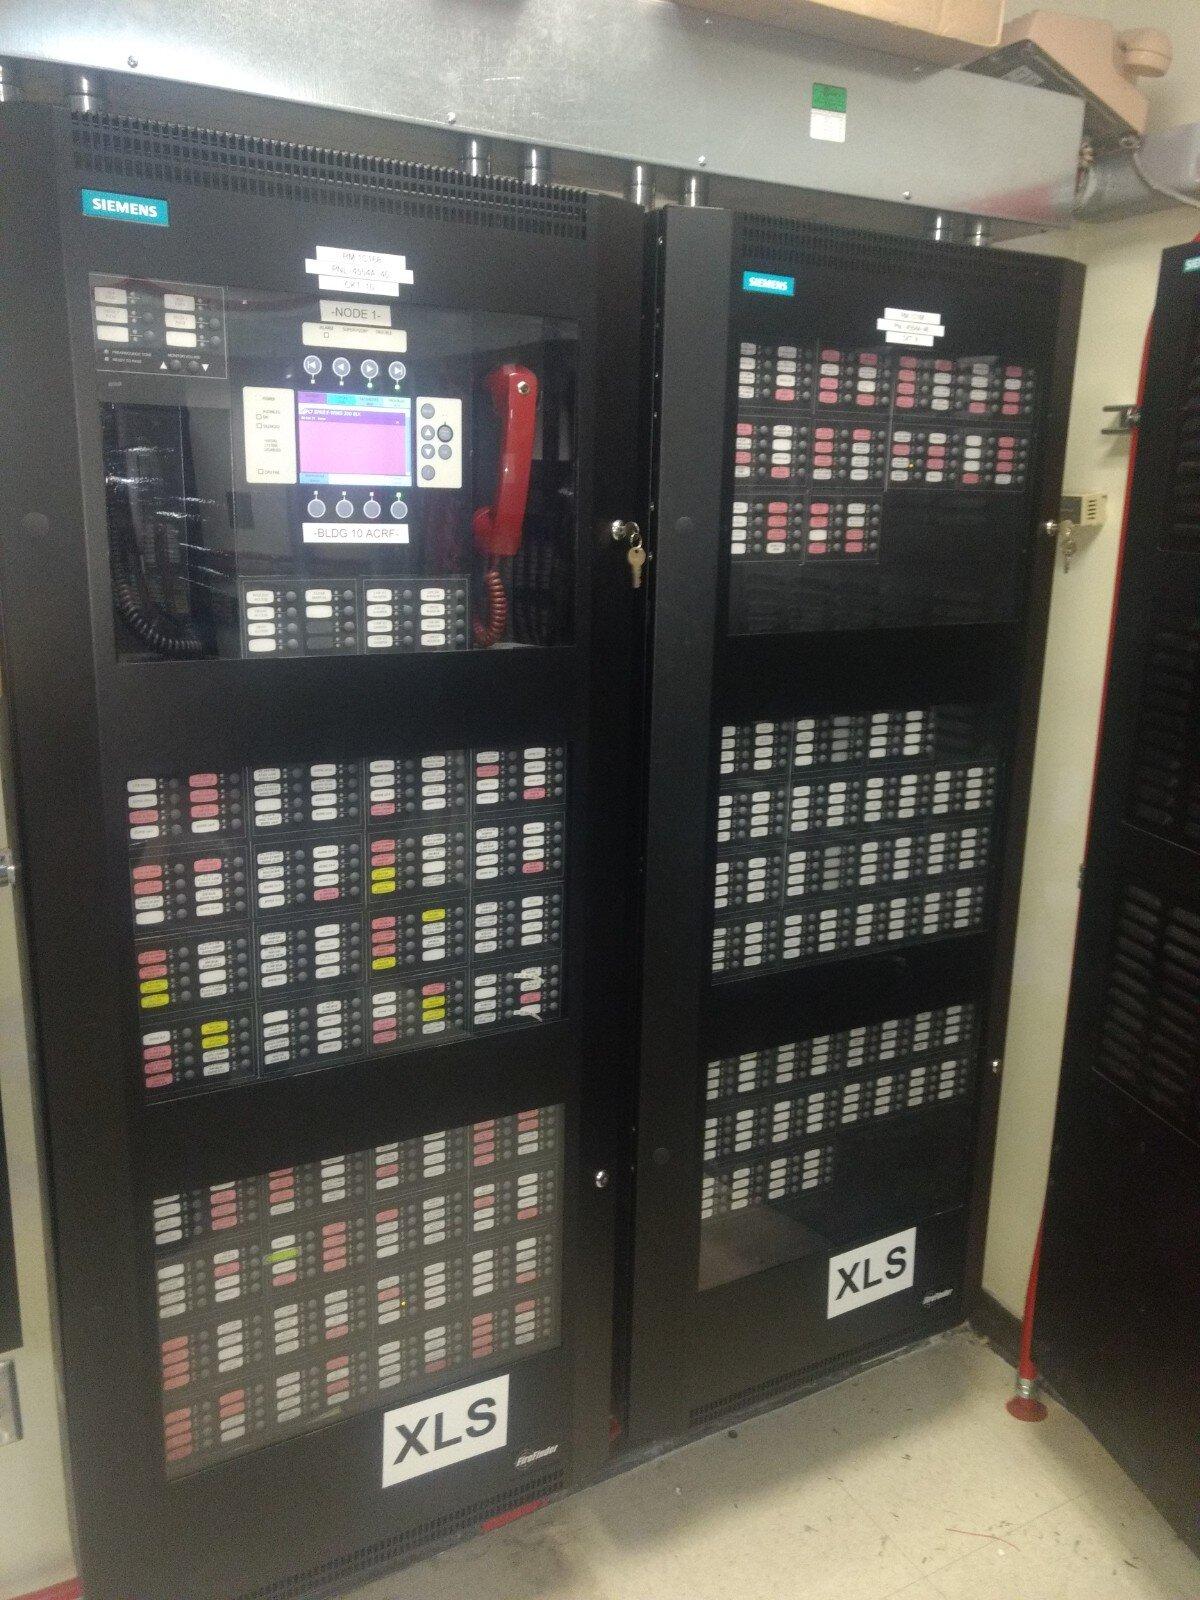 NIH Building 10 Fire Alarm Upgrade